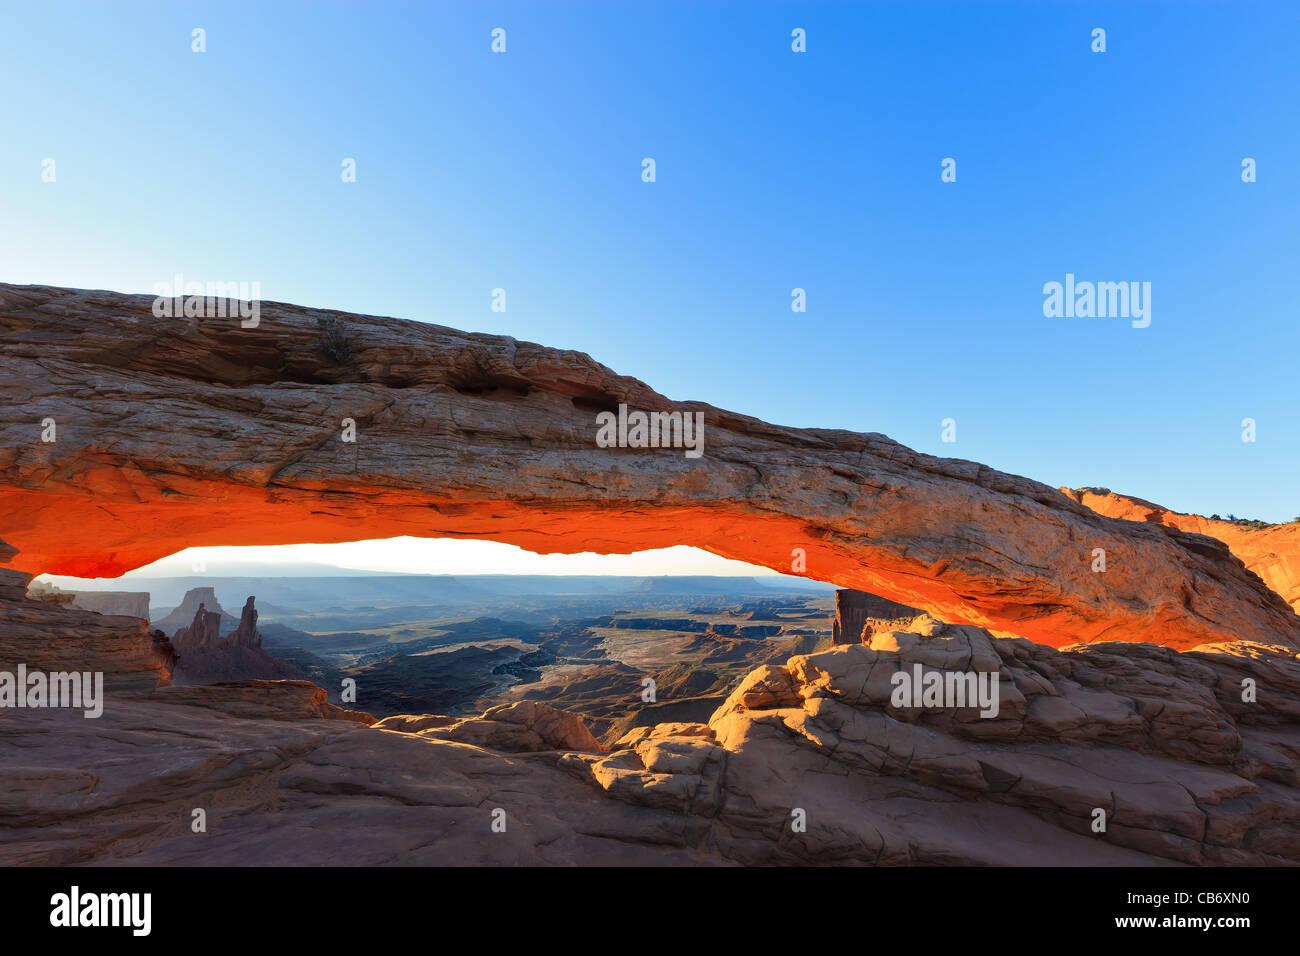 Sunrise-Mesa Arch, Insel im Stadtteil Himmel, Canyonlands National Park Stockbild